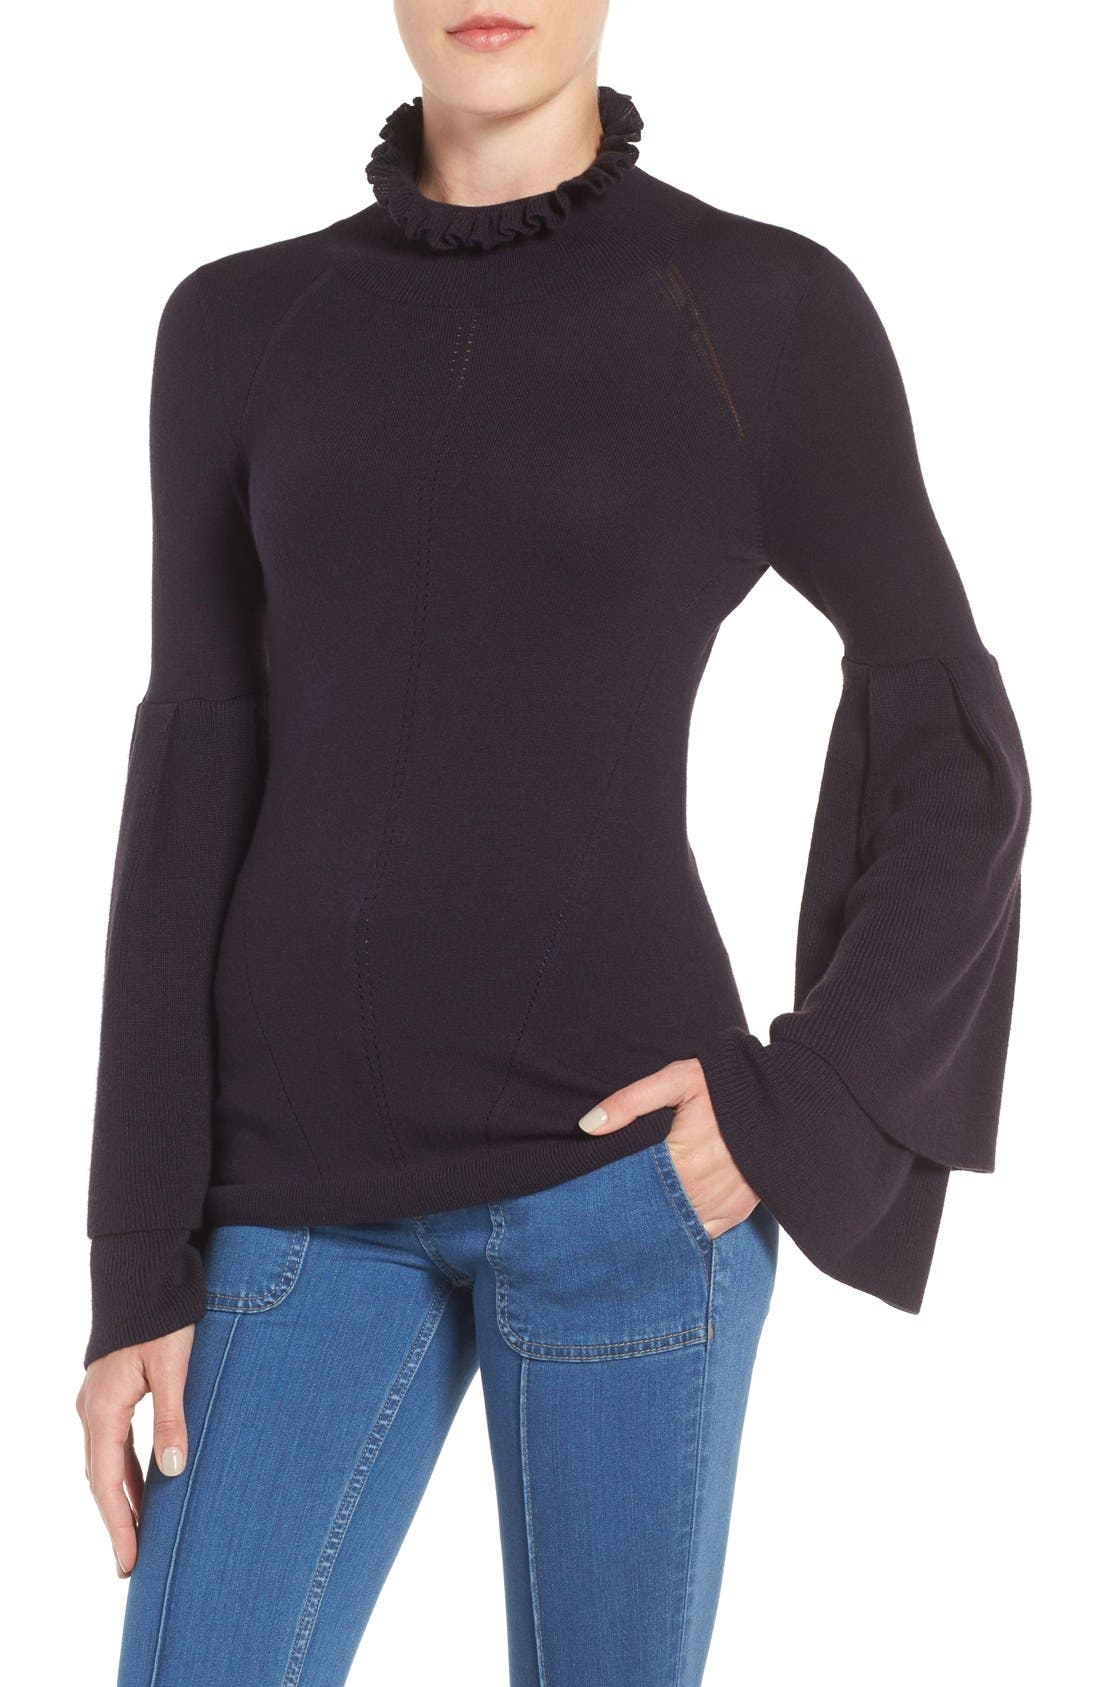 Alternate Image 1 Selected - Olivia Palermo + Chelsea 28 Bell Sleeve Sweater